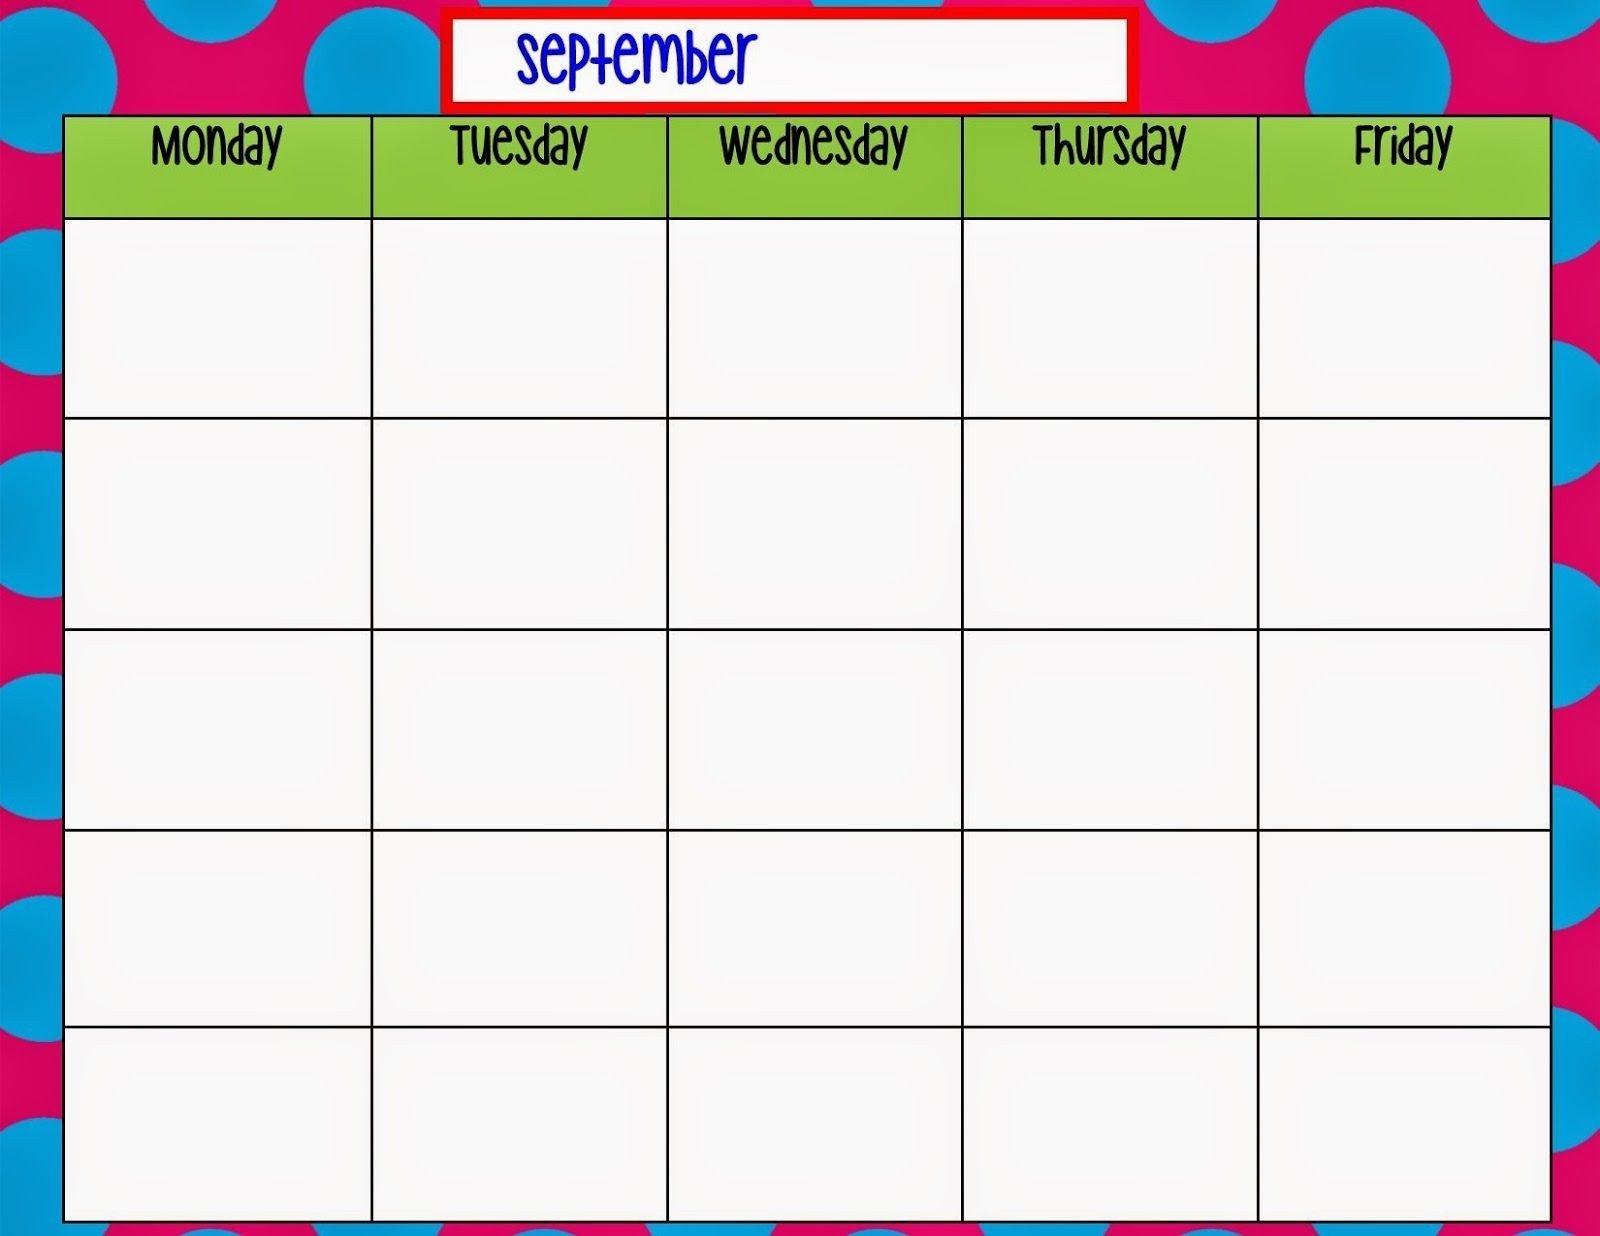 Monday To Friday Blank Calendar Printable   Calendar Monday To Friday Tempate Printable